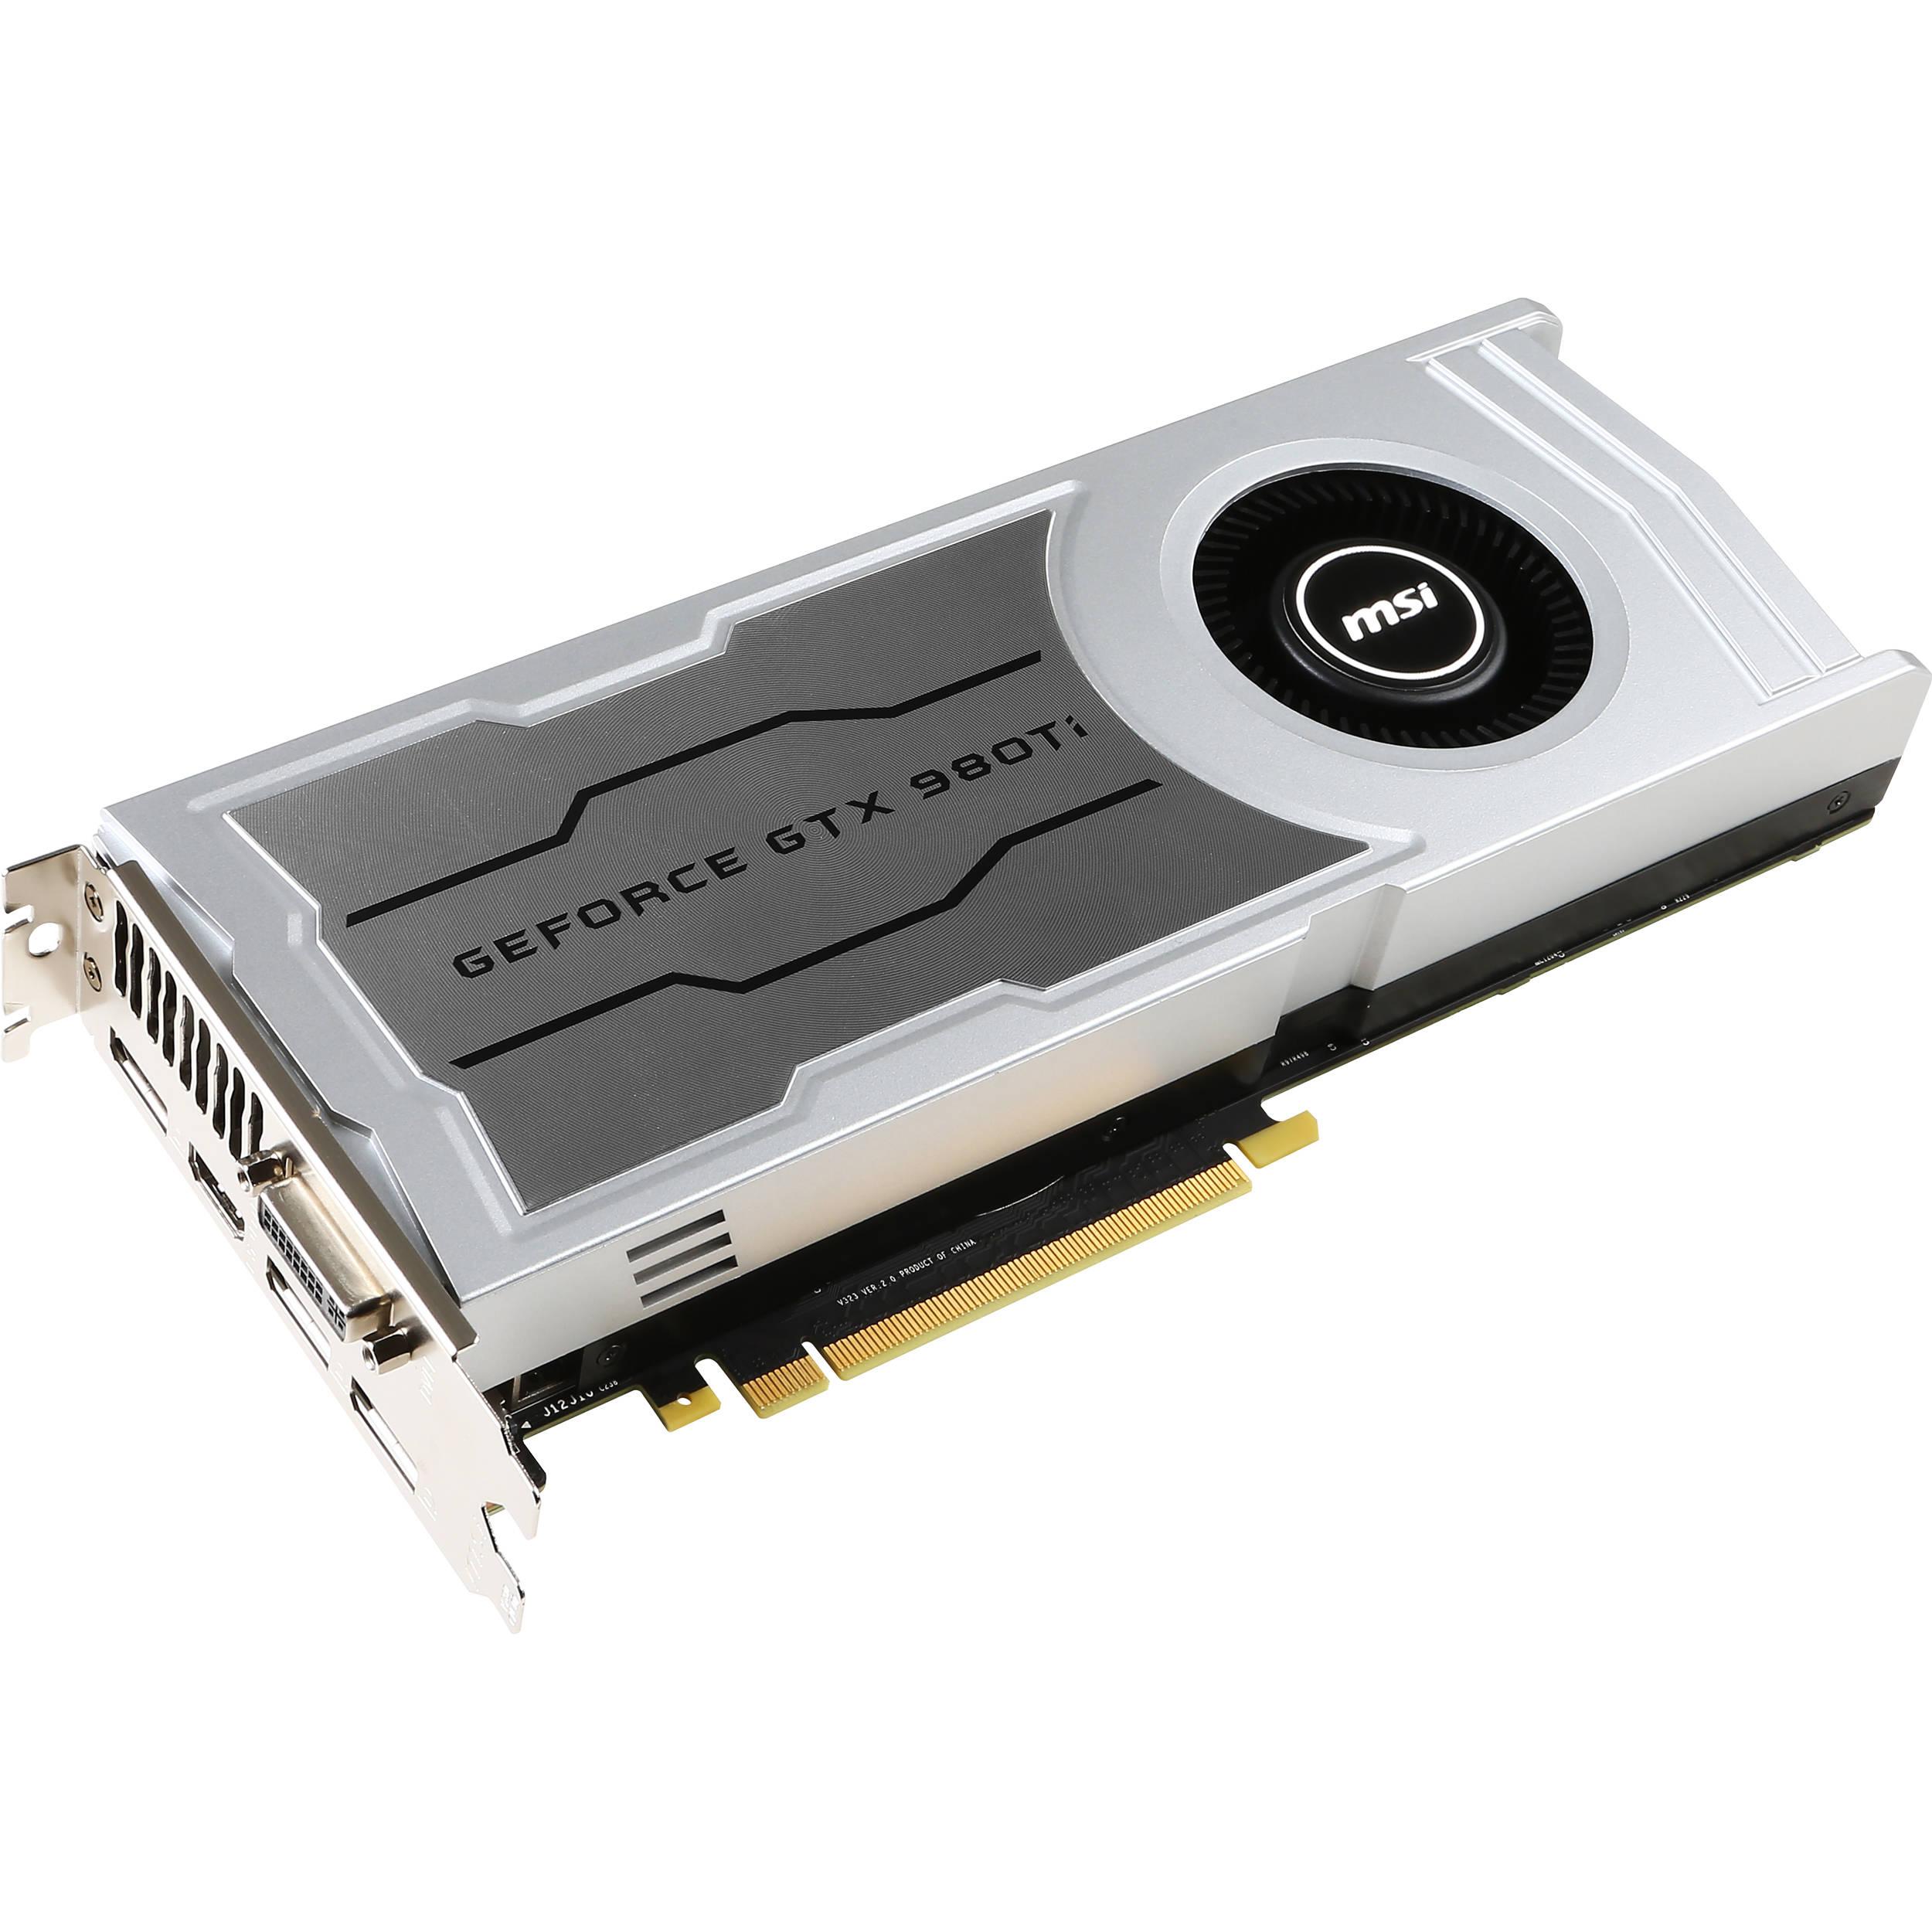 MSI GeForce GTX 980 Ti V1 Graphics Card